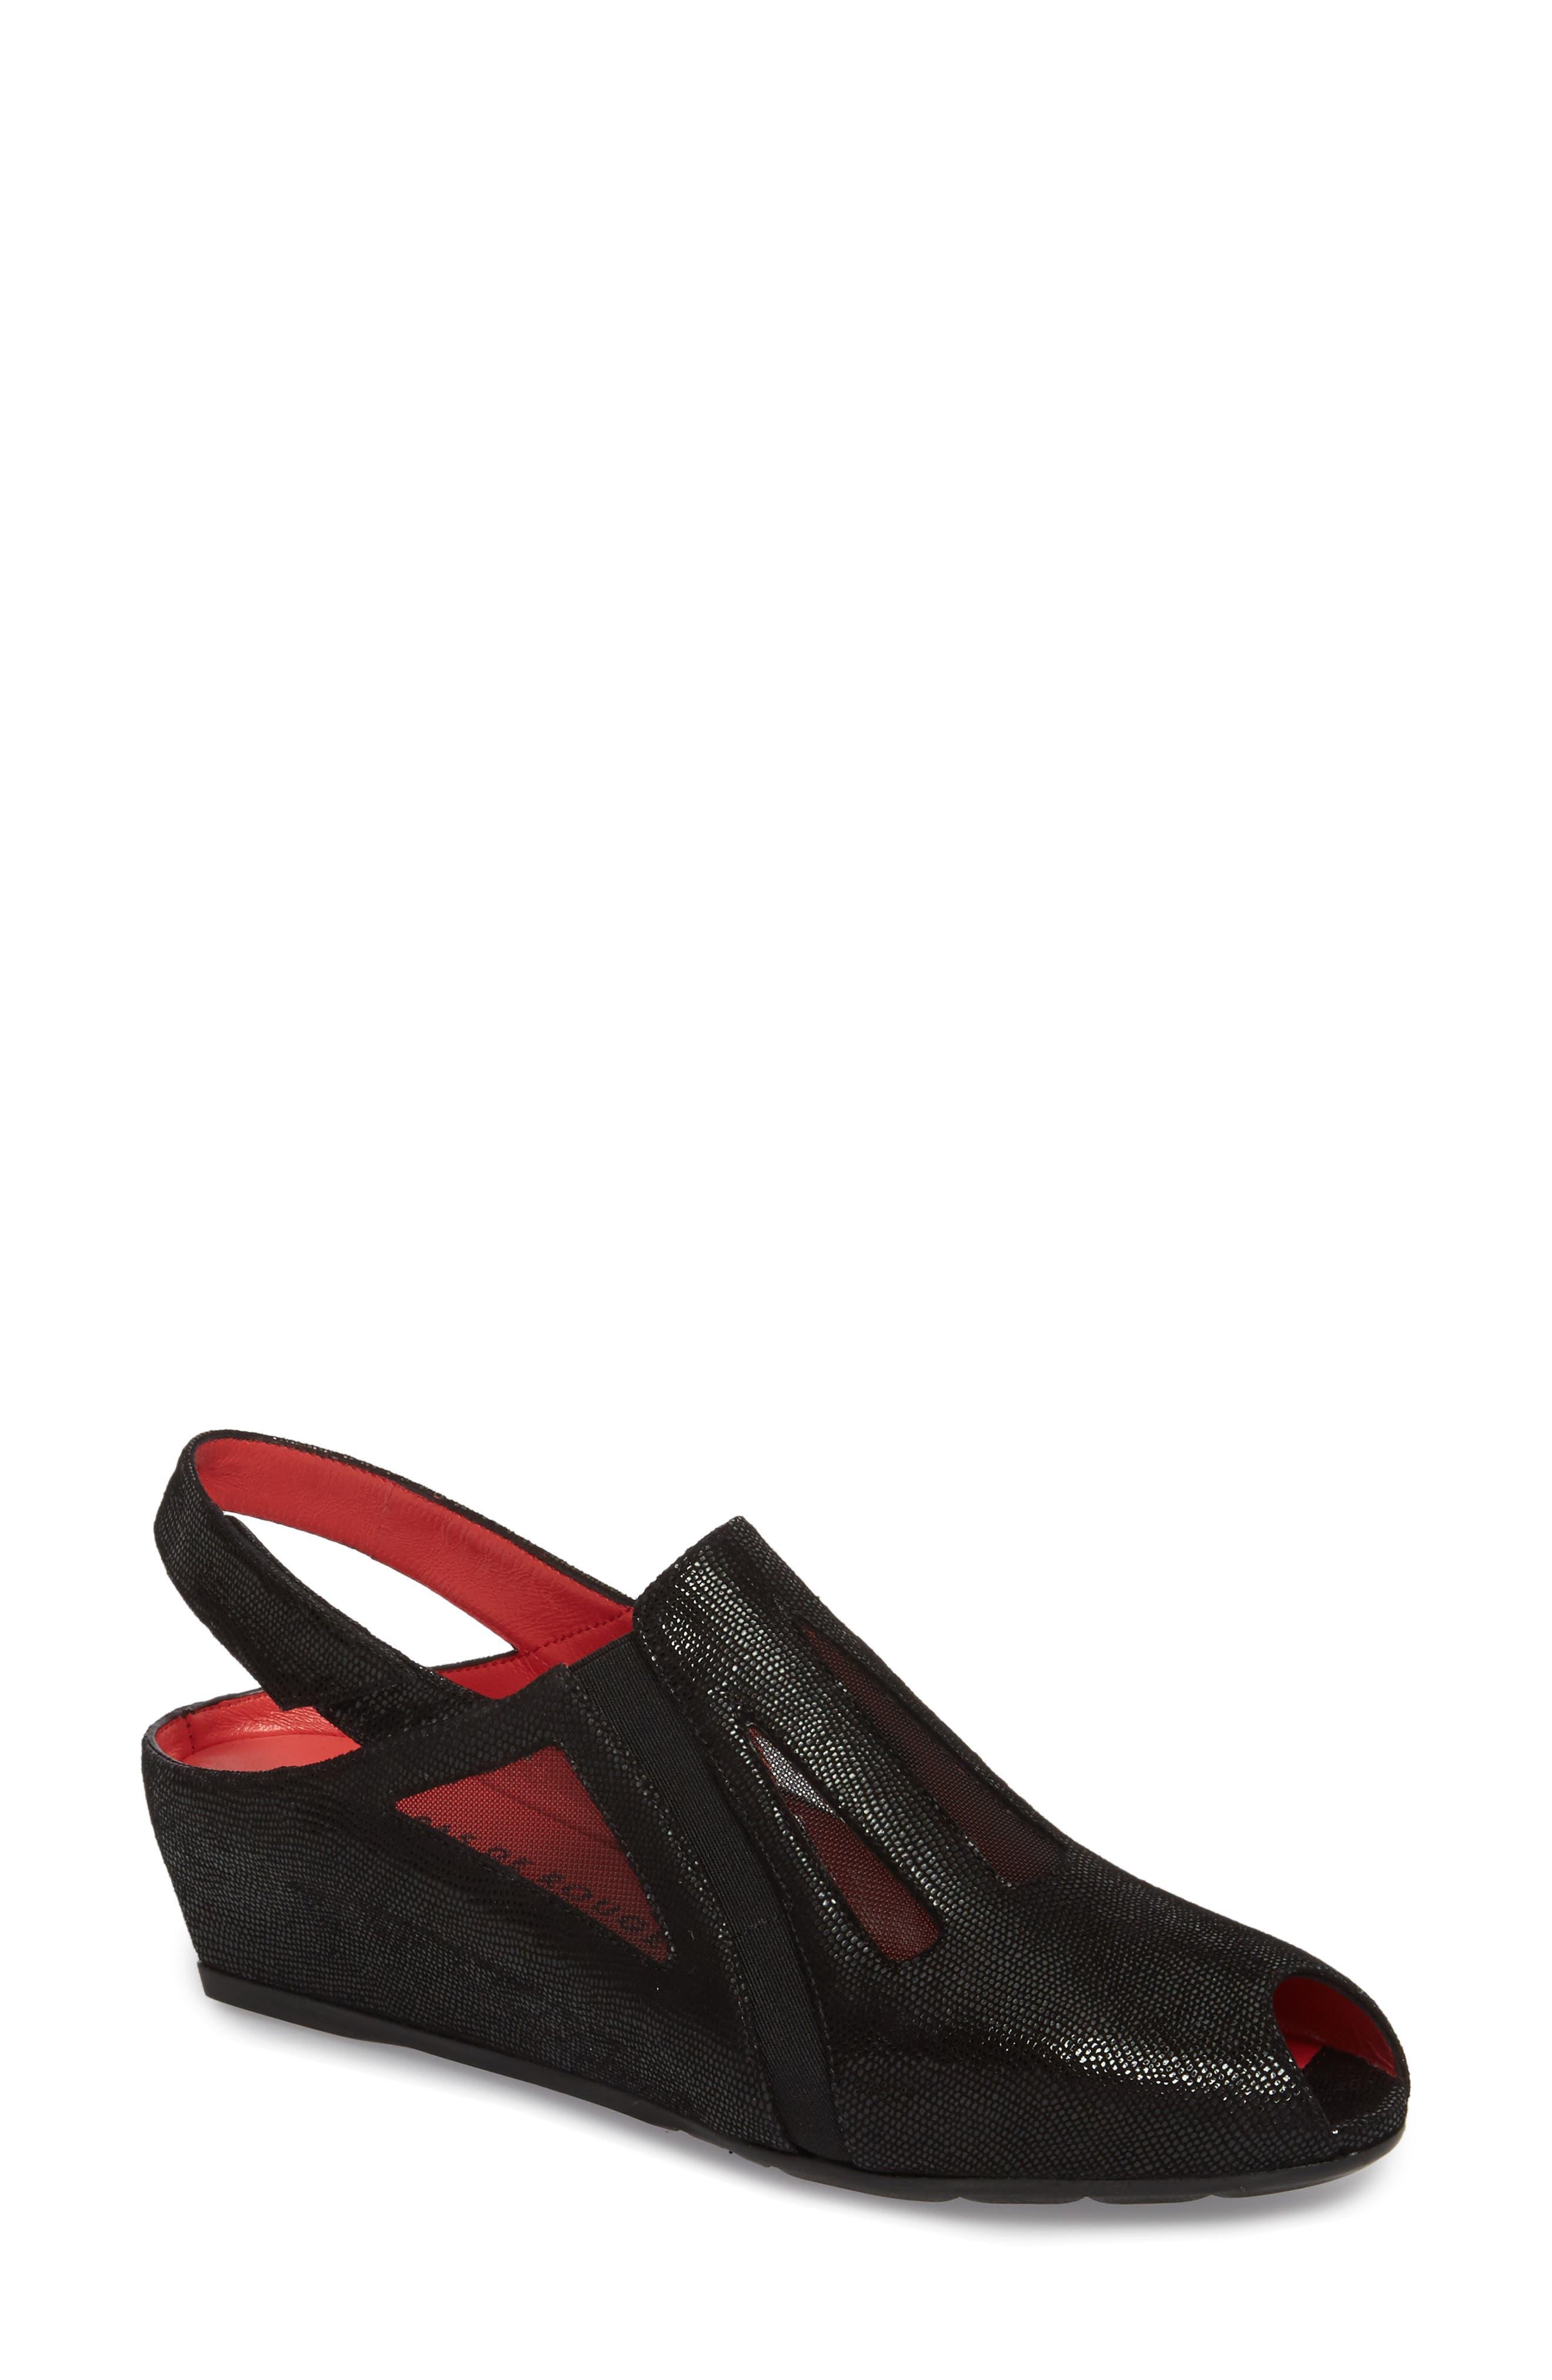 Franca Slingback Sandal,                         Main,                         color, Black Lizard Suede